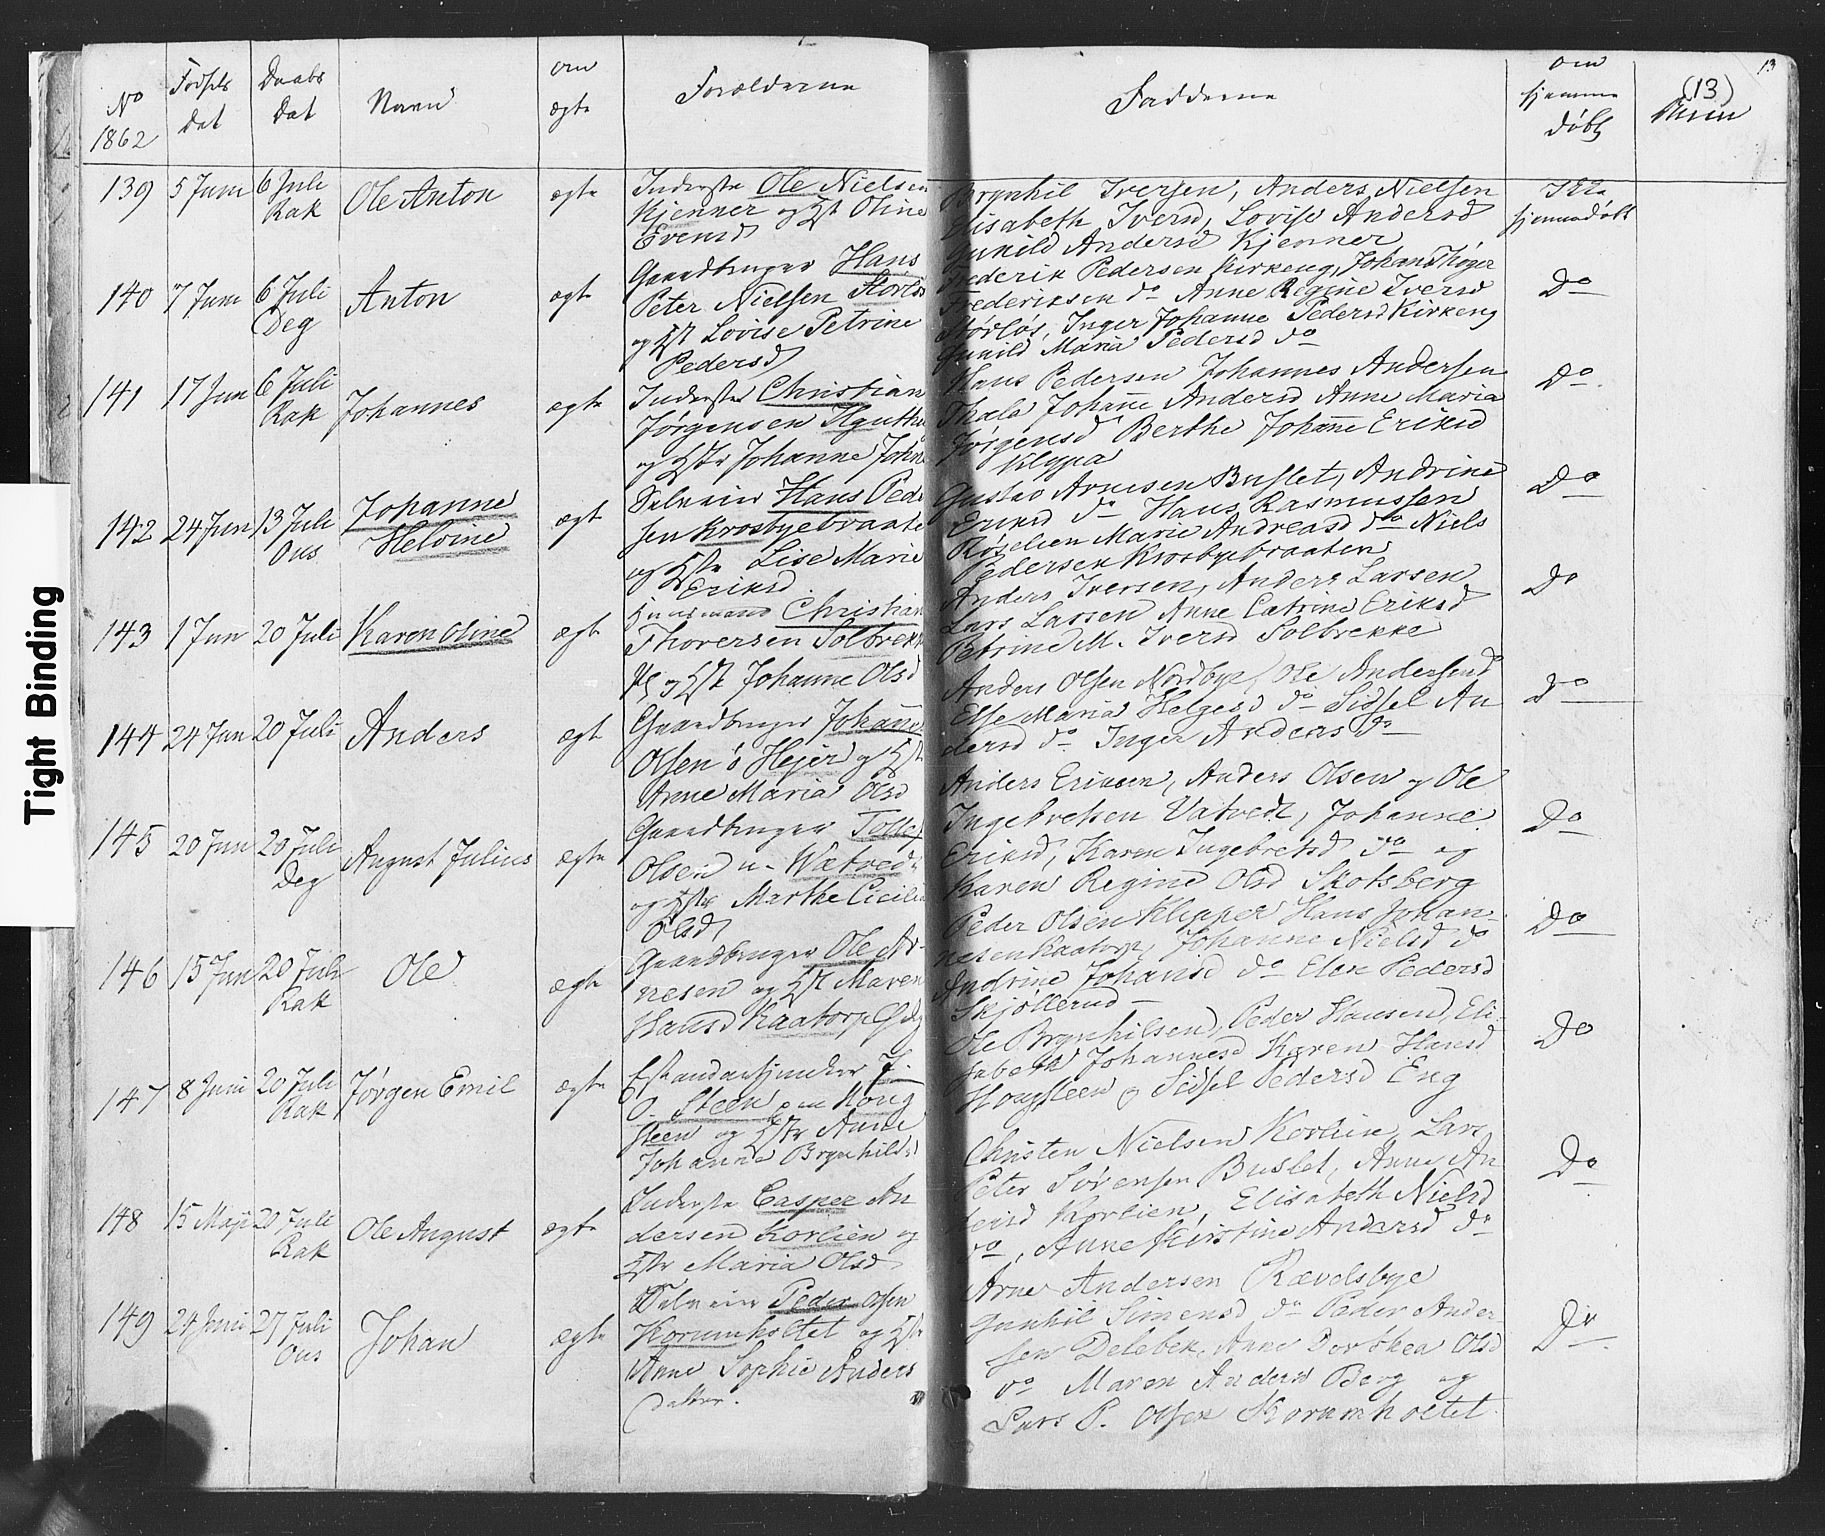 SAO, Rakkestad prestekontor Kirkebøker, F/Fa/L0011: Ministerialbok nr. I 11, 1862-1877, s. 13